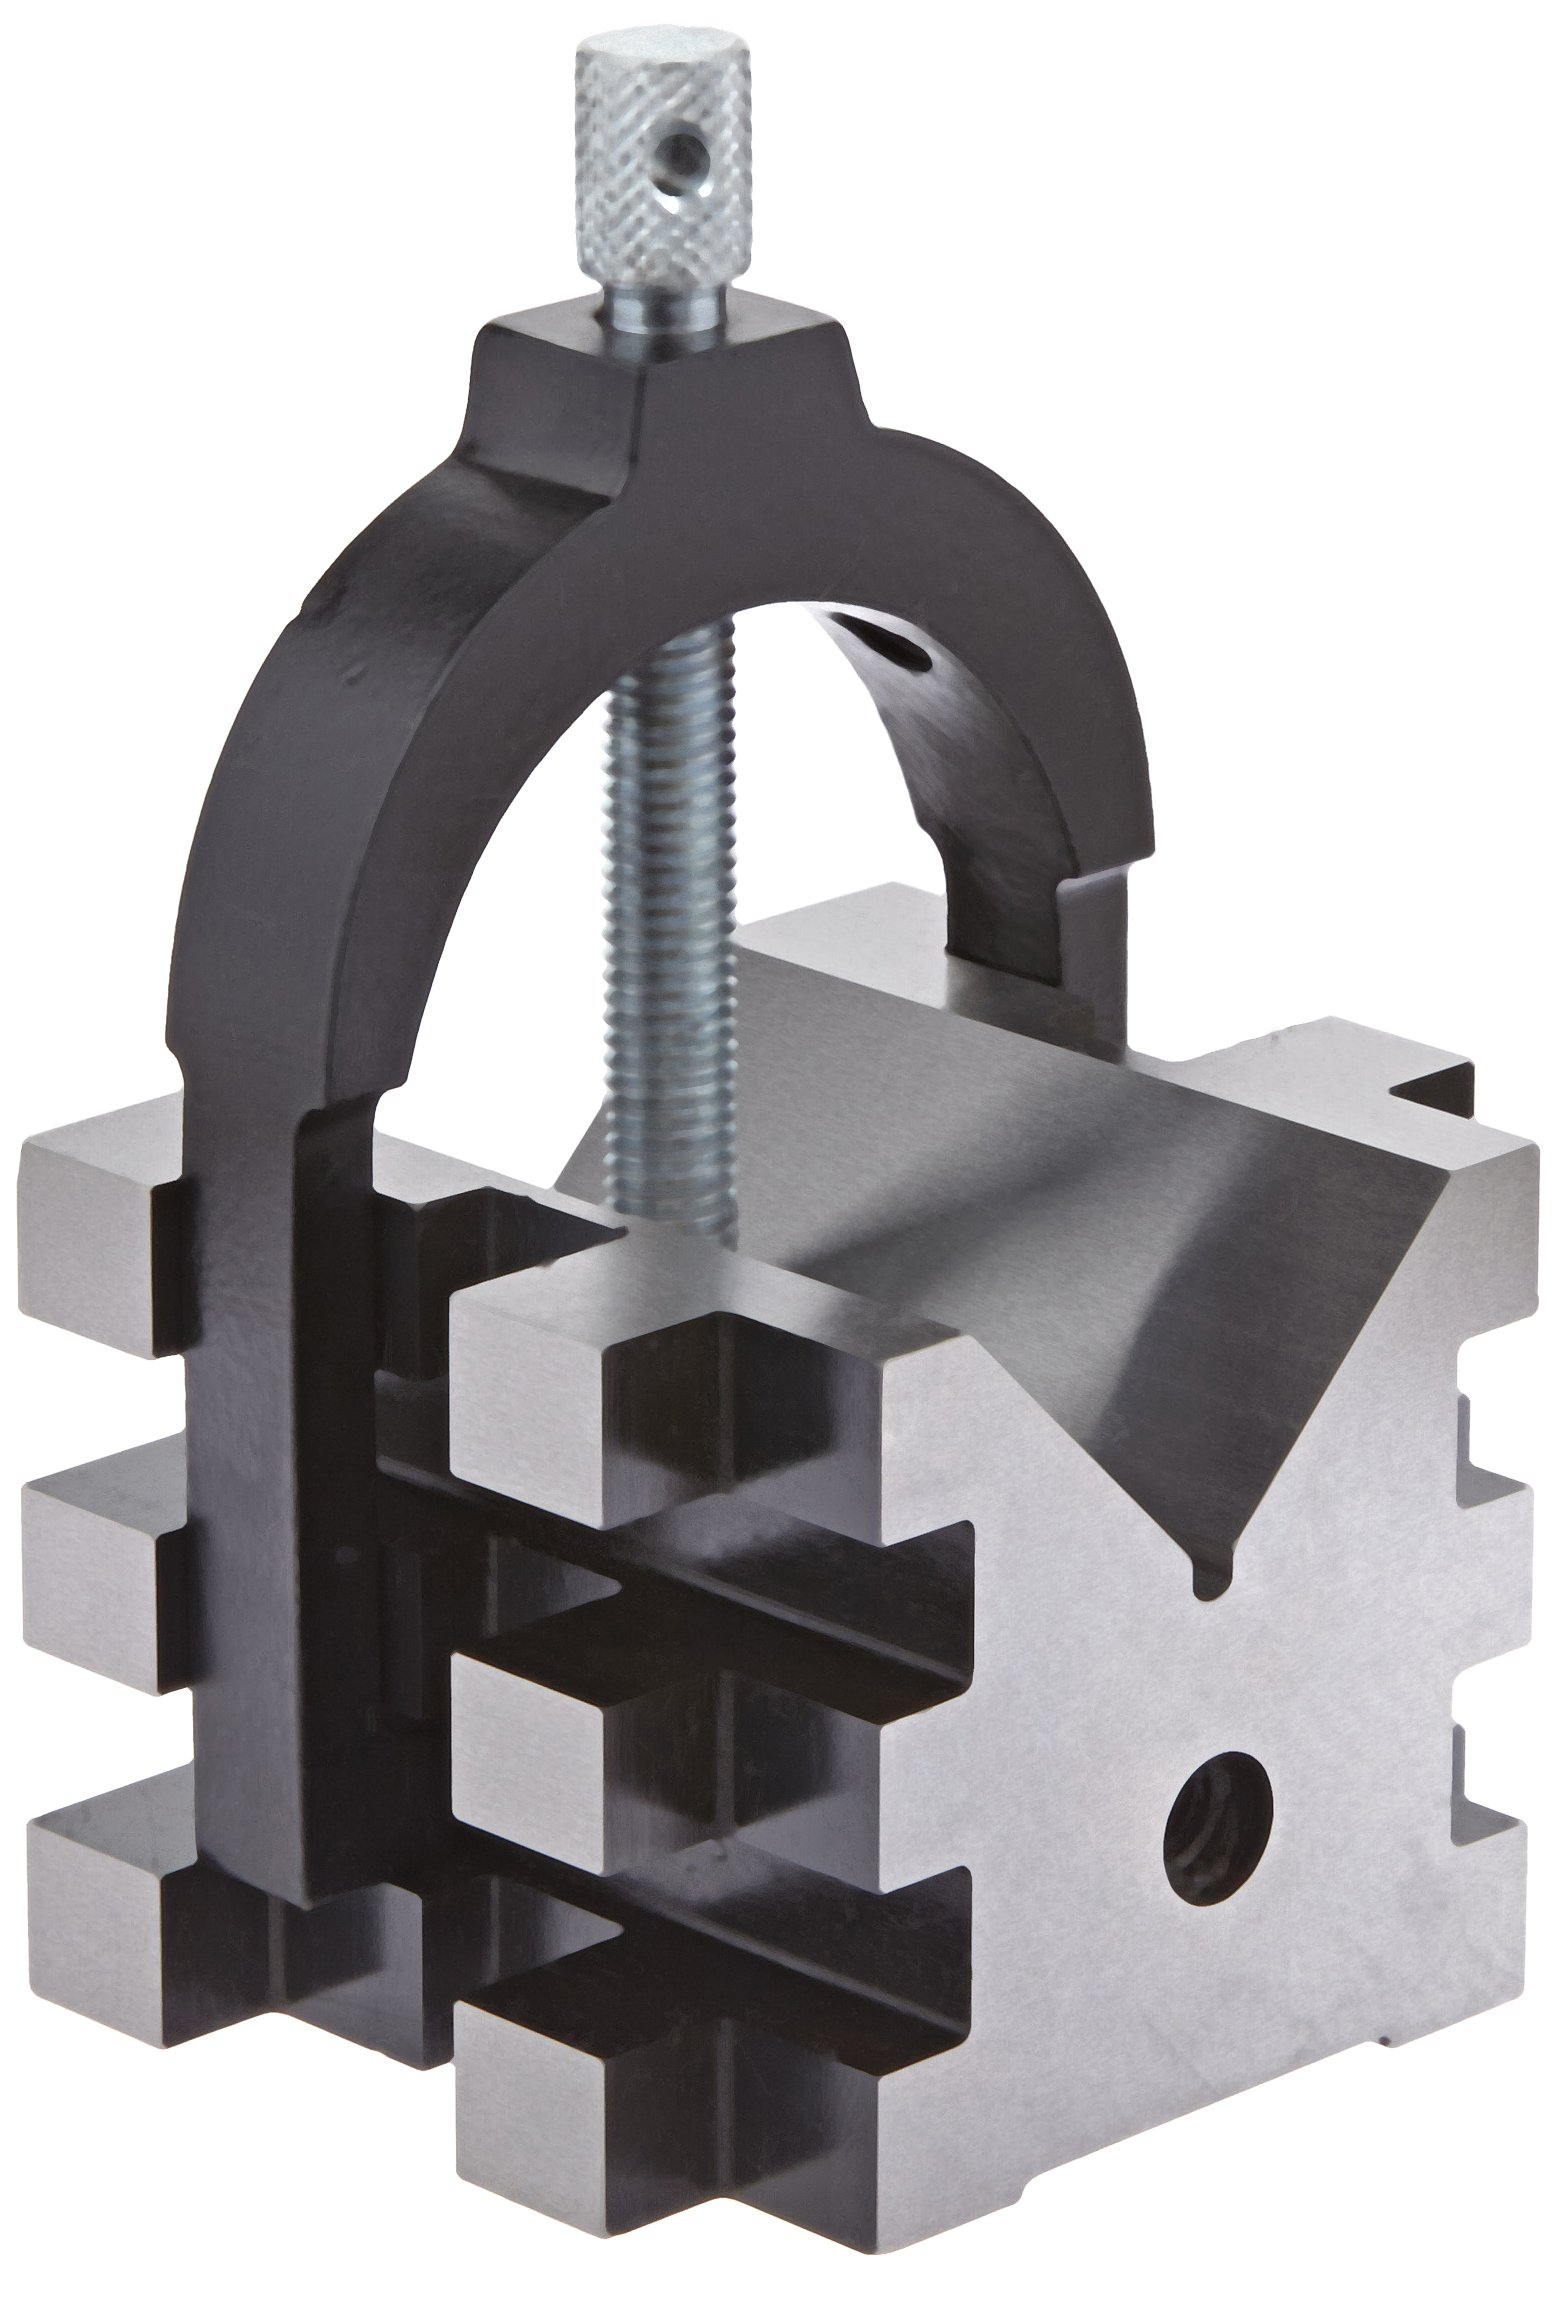 Fowler 52-475-555 Hardened steel V-Block Set, 2'' Clamping Capacity, 2'' H x 2.25'' length x 2'' width